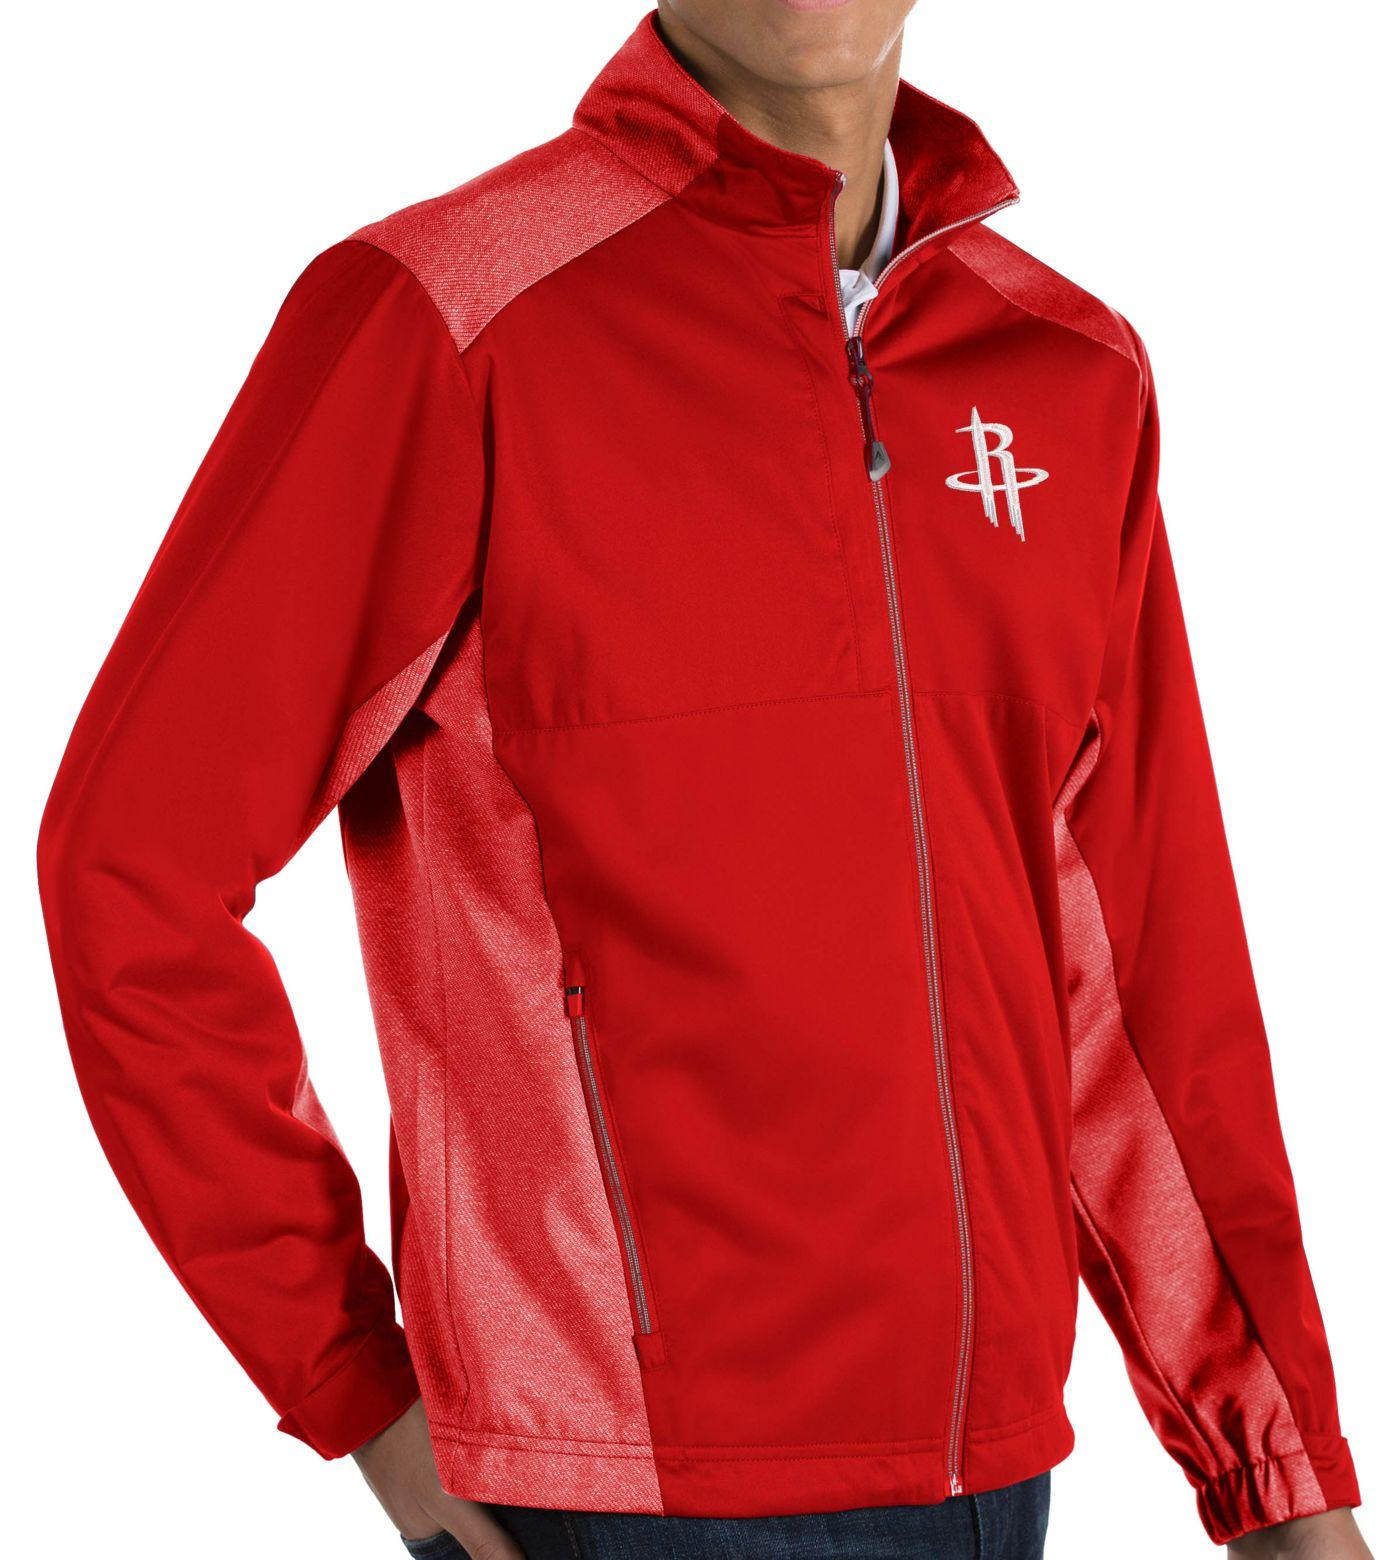 Antigua Men's Houston Rockets Revolve Full-Zip Jacket